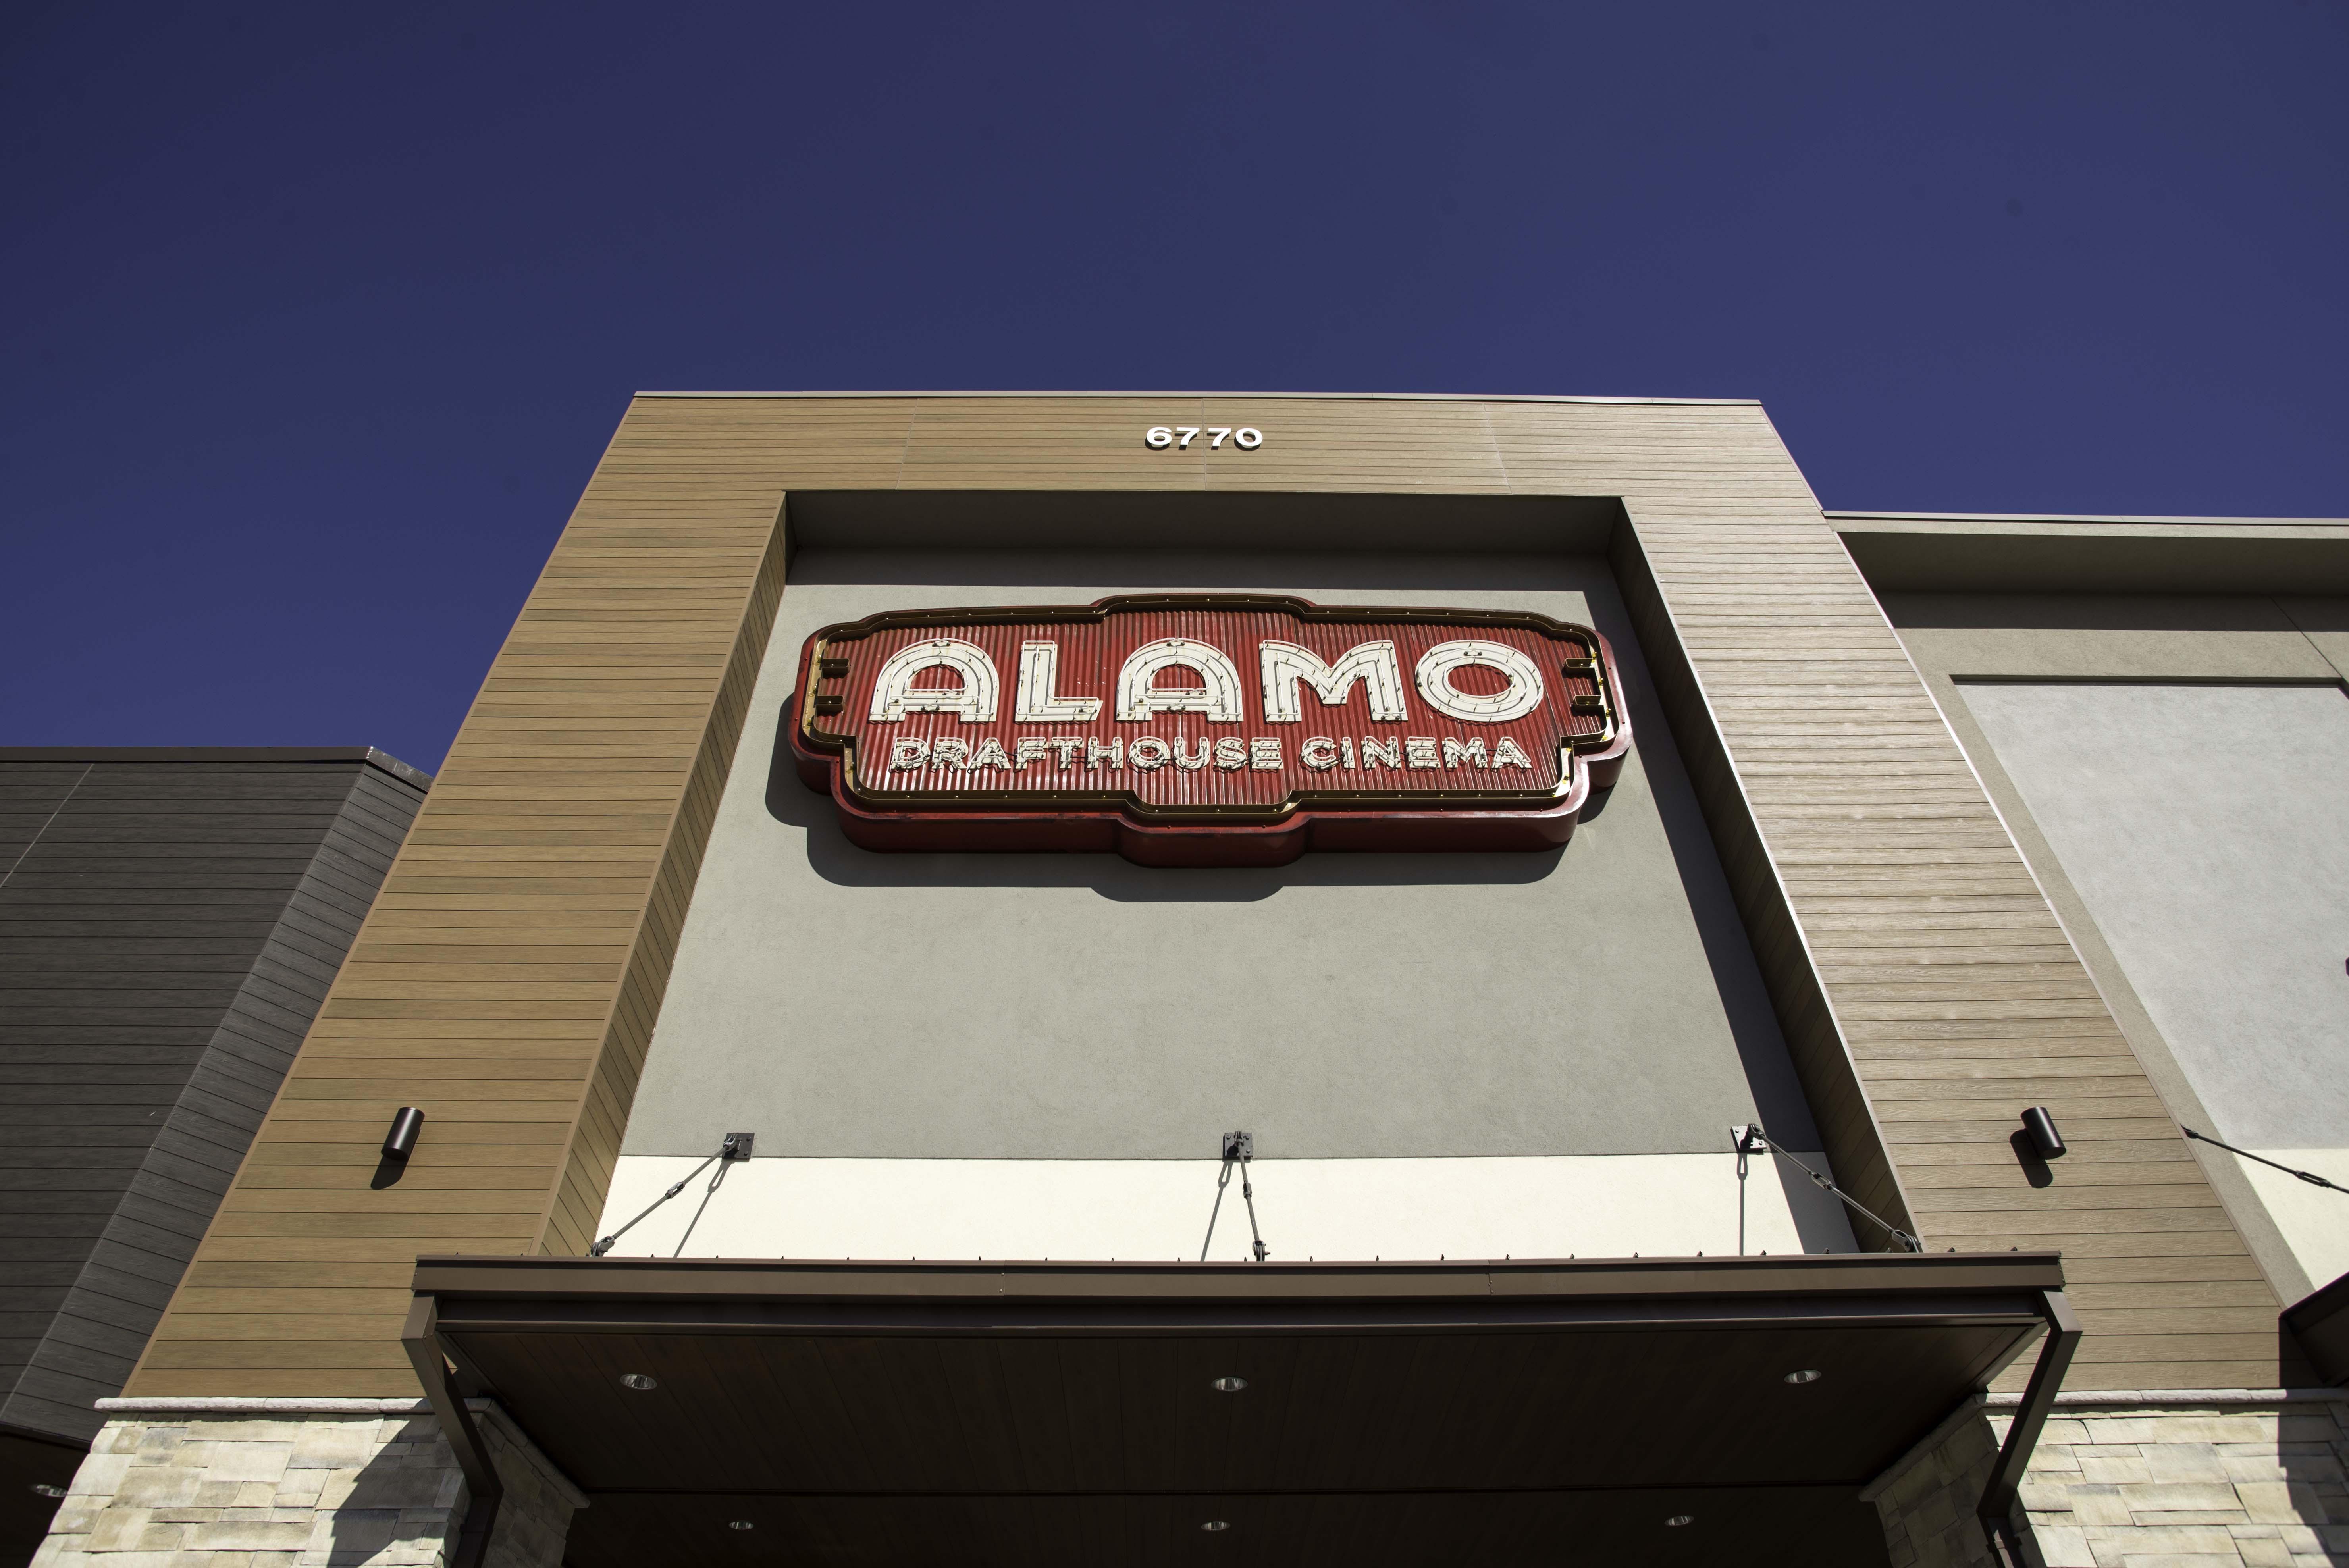 Alamo upshot